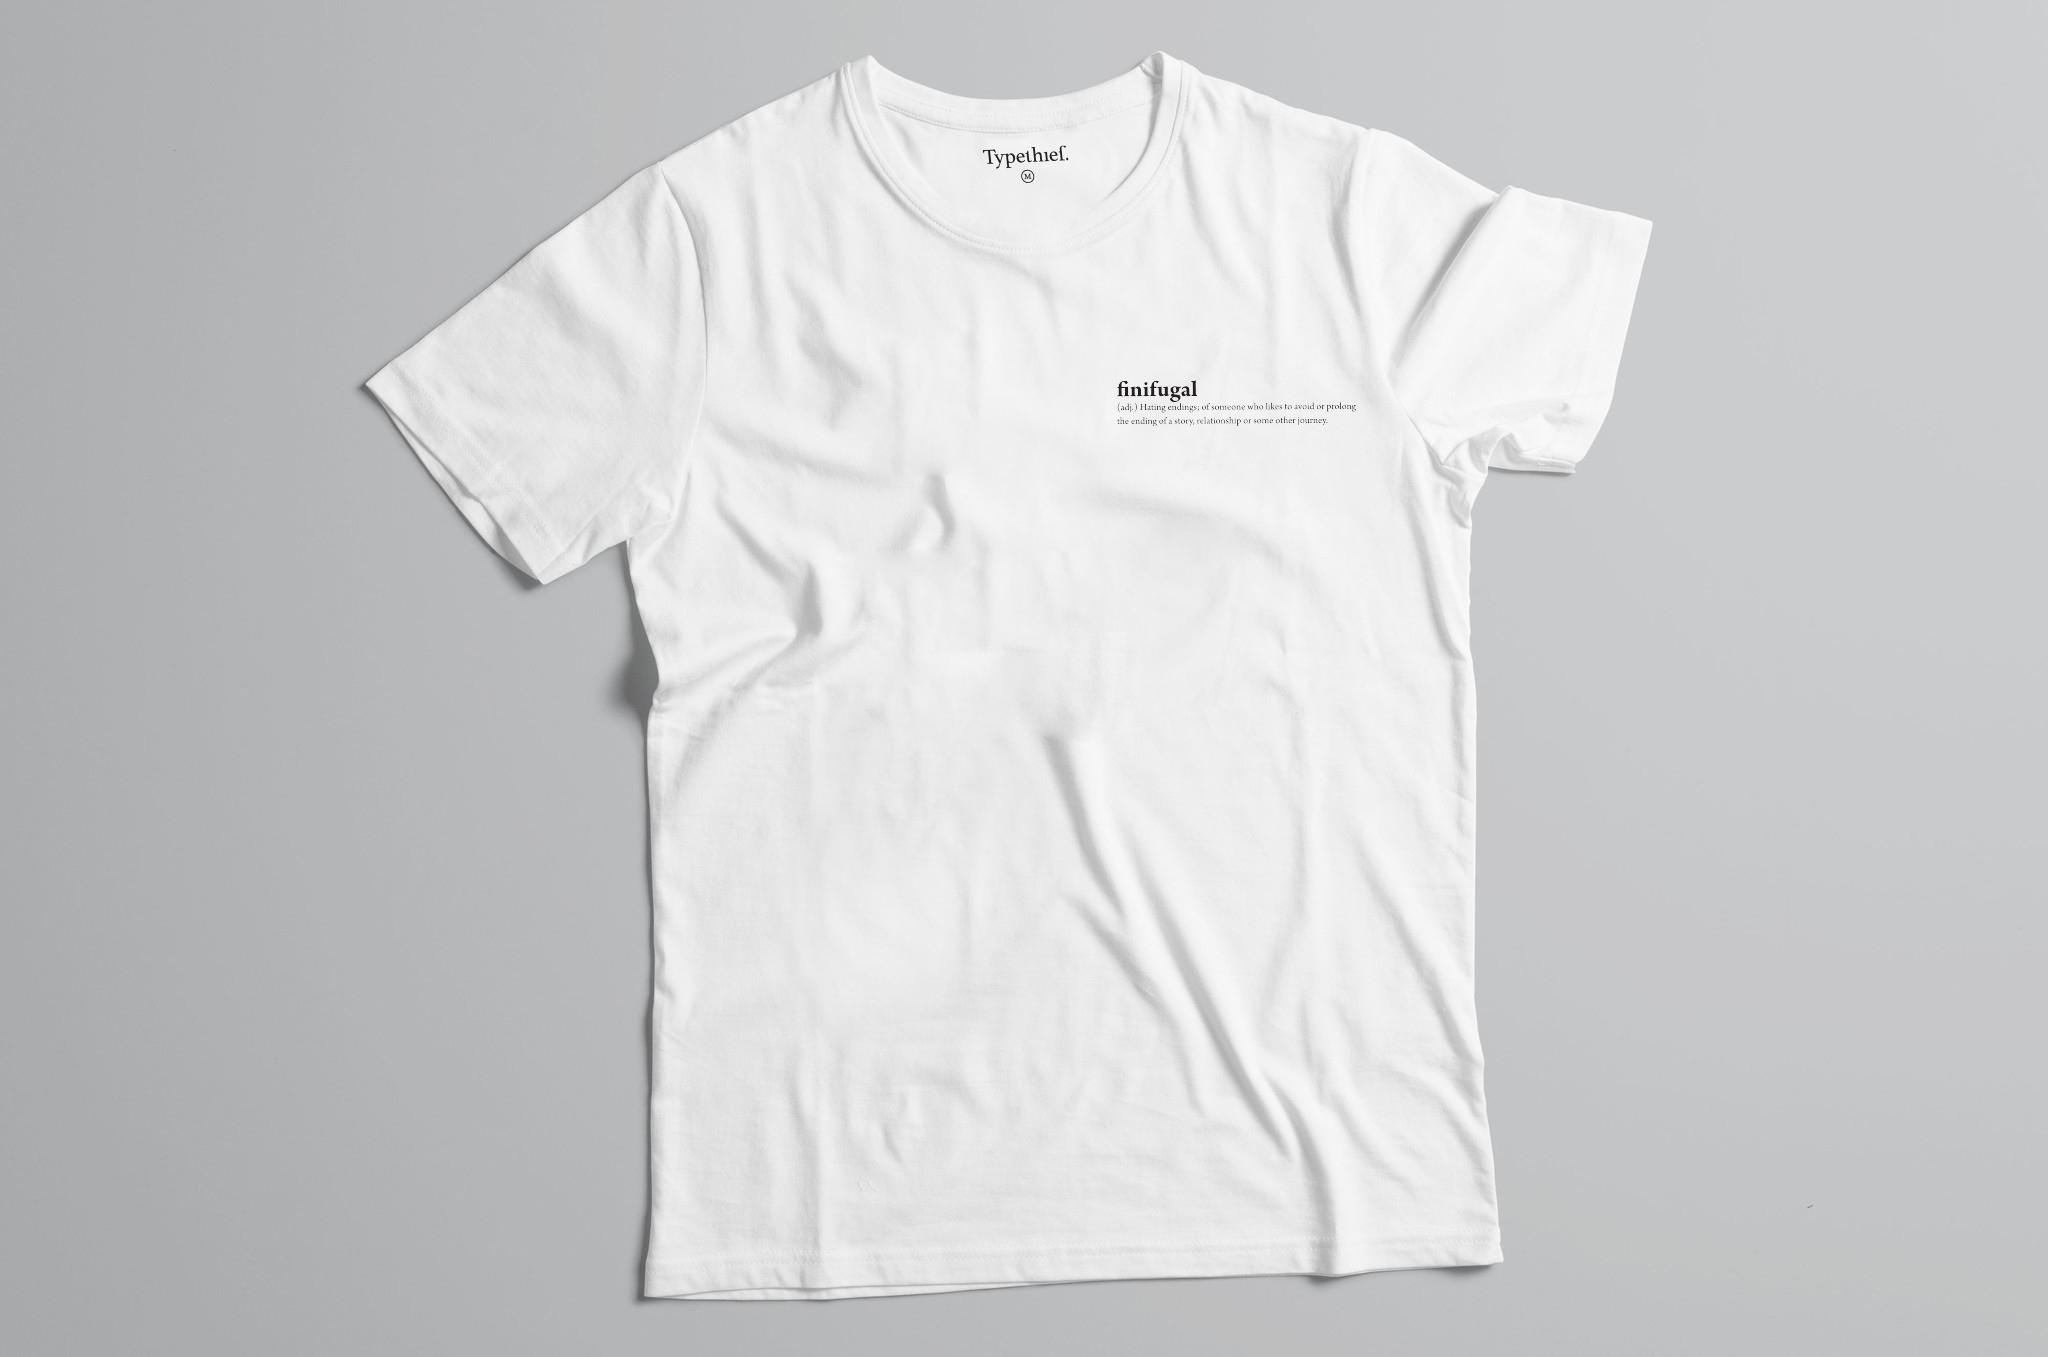 Typethief_Bespoke_Type_Branding_Clothing_Fashion_1